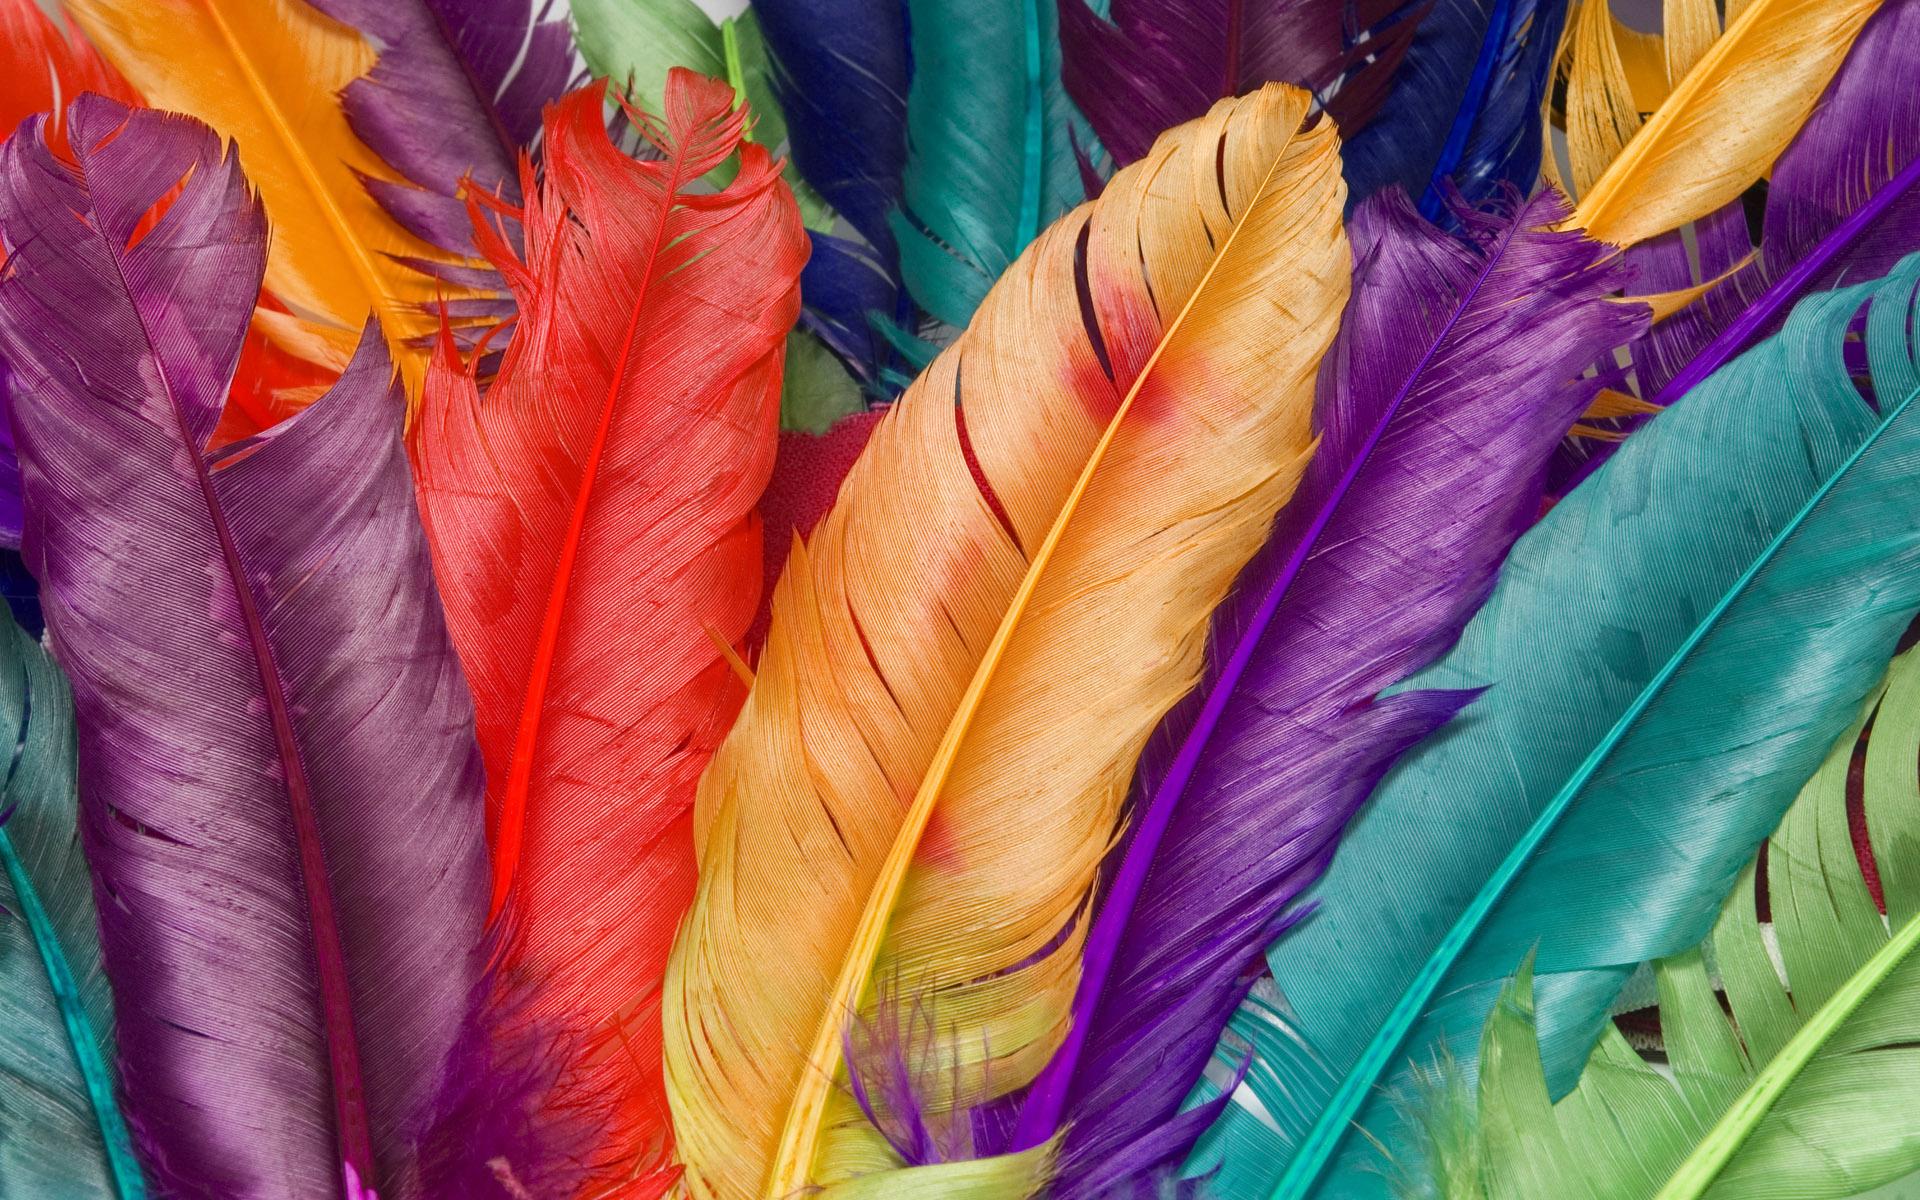 Hd wallpaper colorful - Colourful Wallpaper